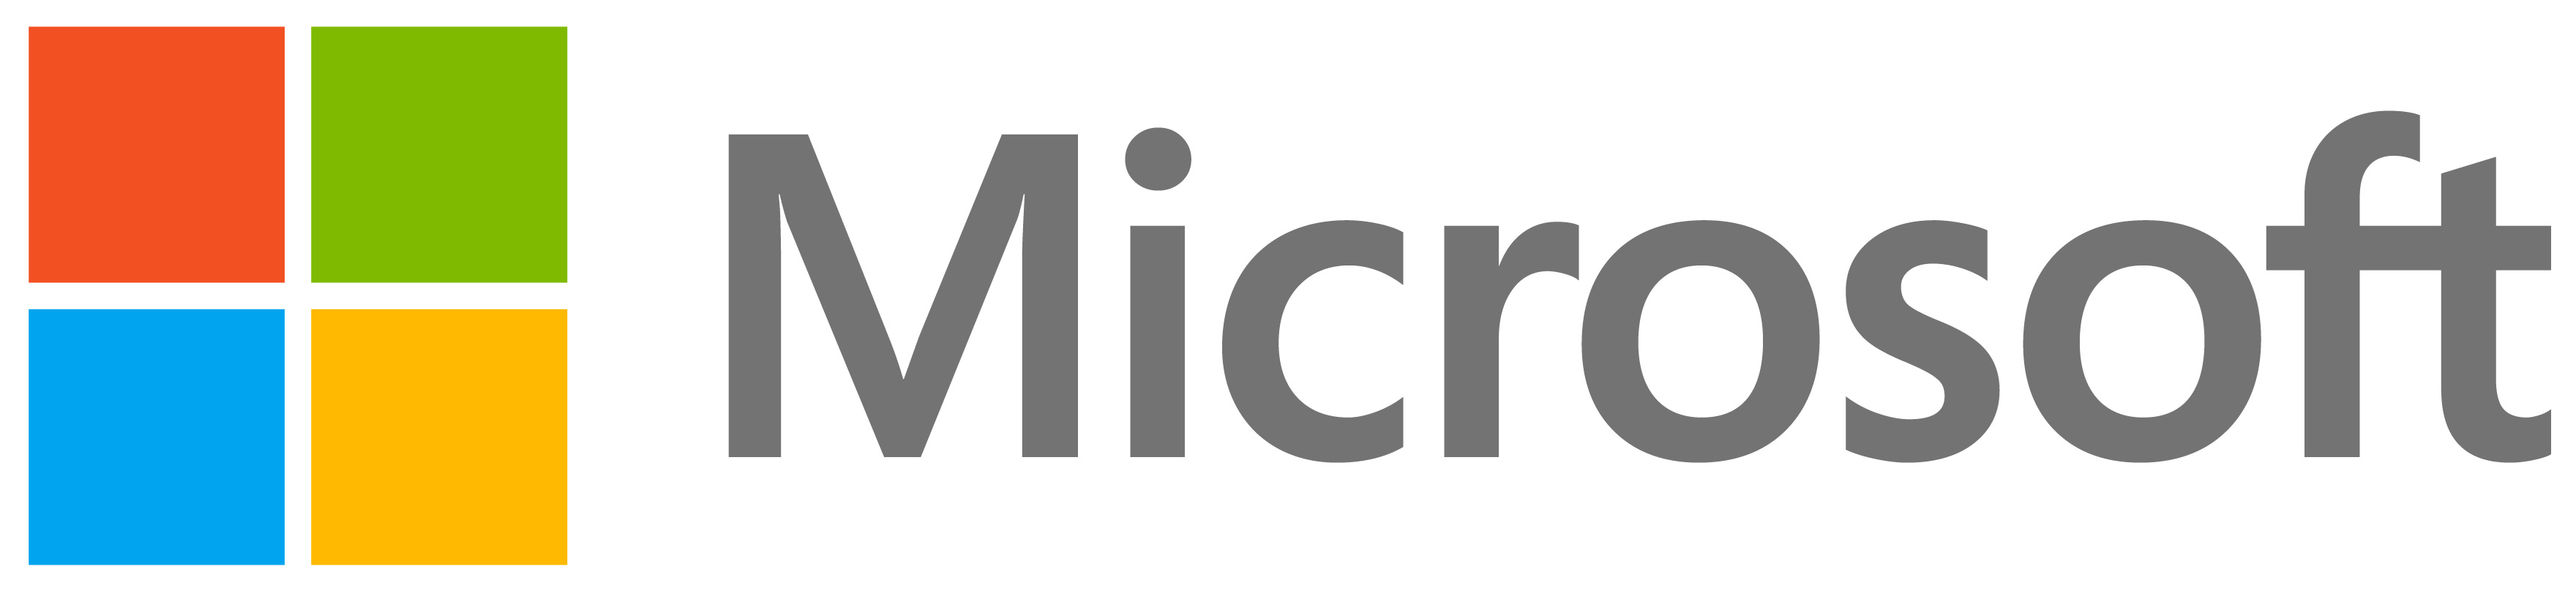 new-microsoft-logo-square-large